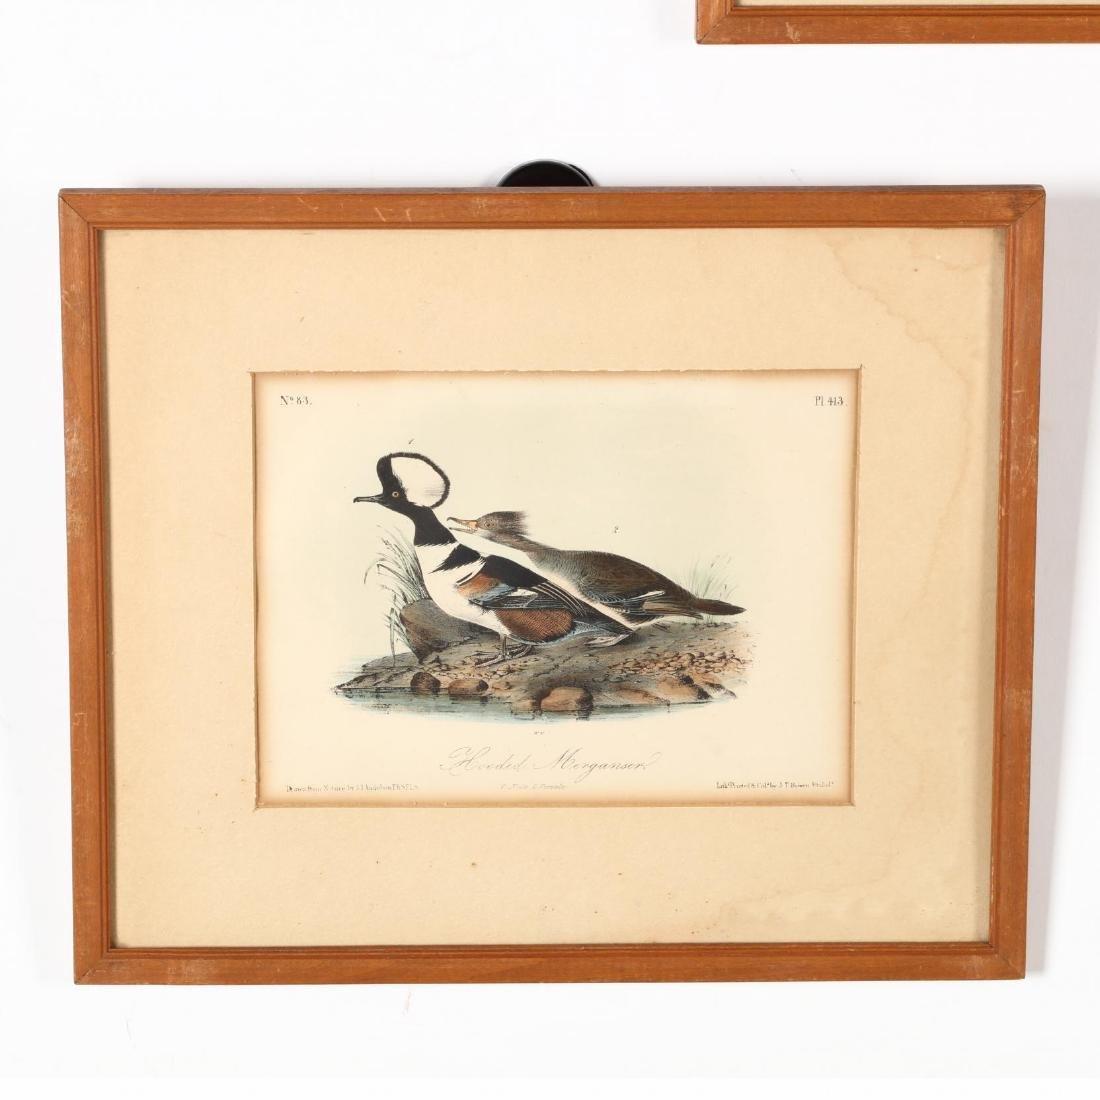 after John James Audubon (Am., 1785-1851), Six Prints - 3